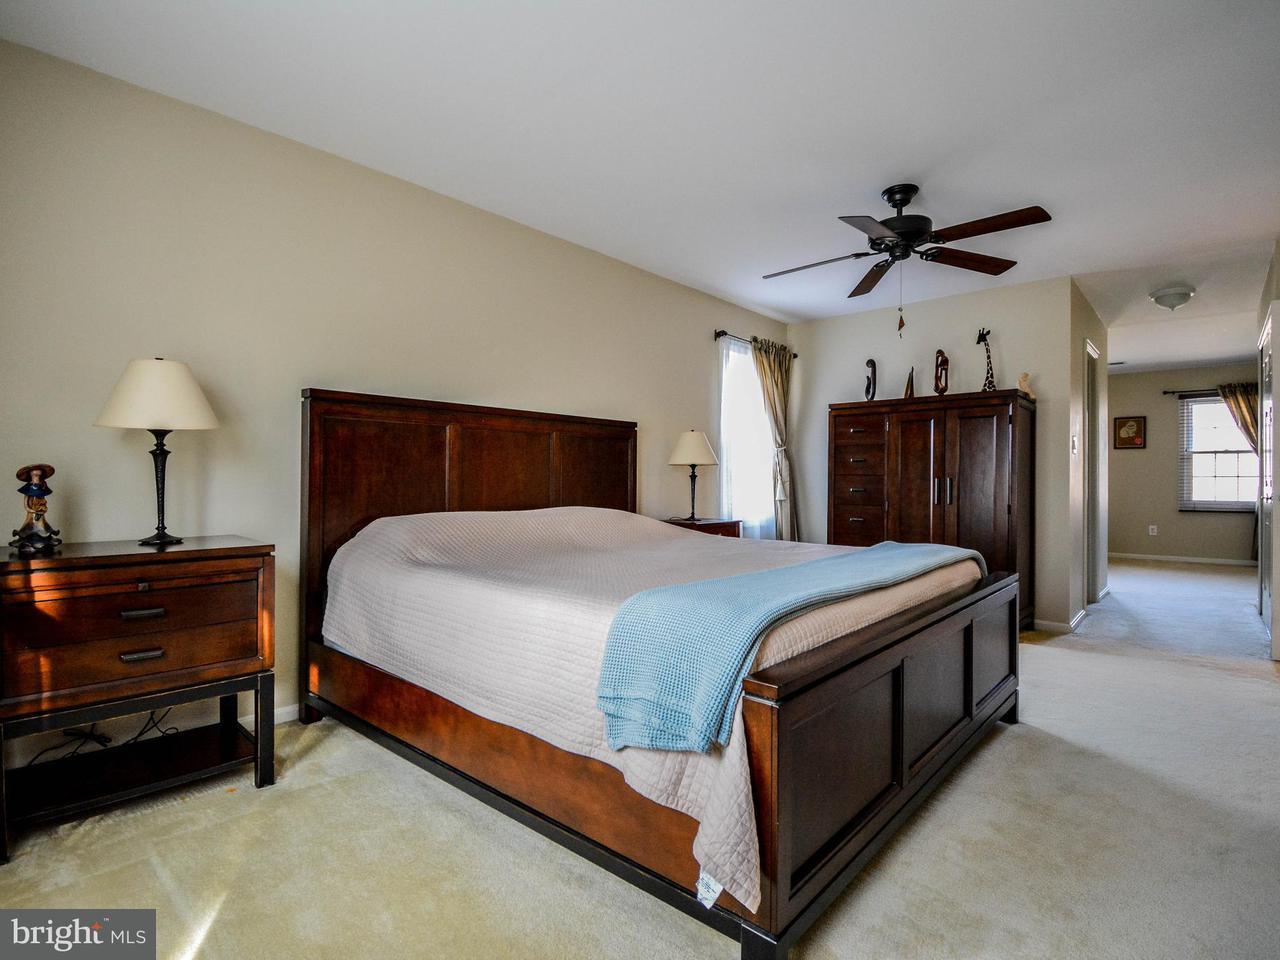 Additional photo for property listing at 11809 Grey Birch Place 11809 Grey Birch Place Reston, Virginia 20191 Estados Unidos